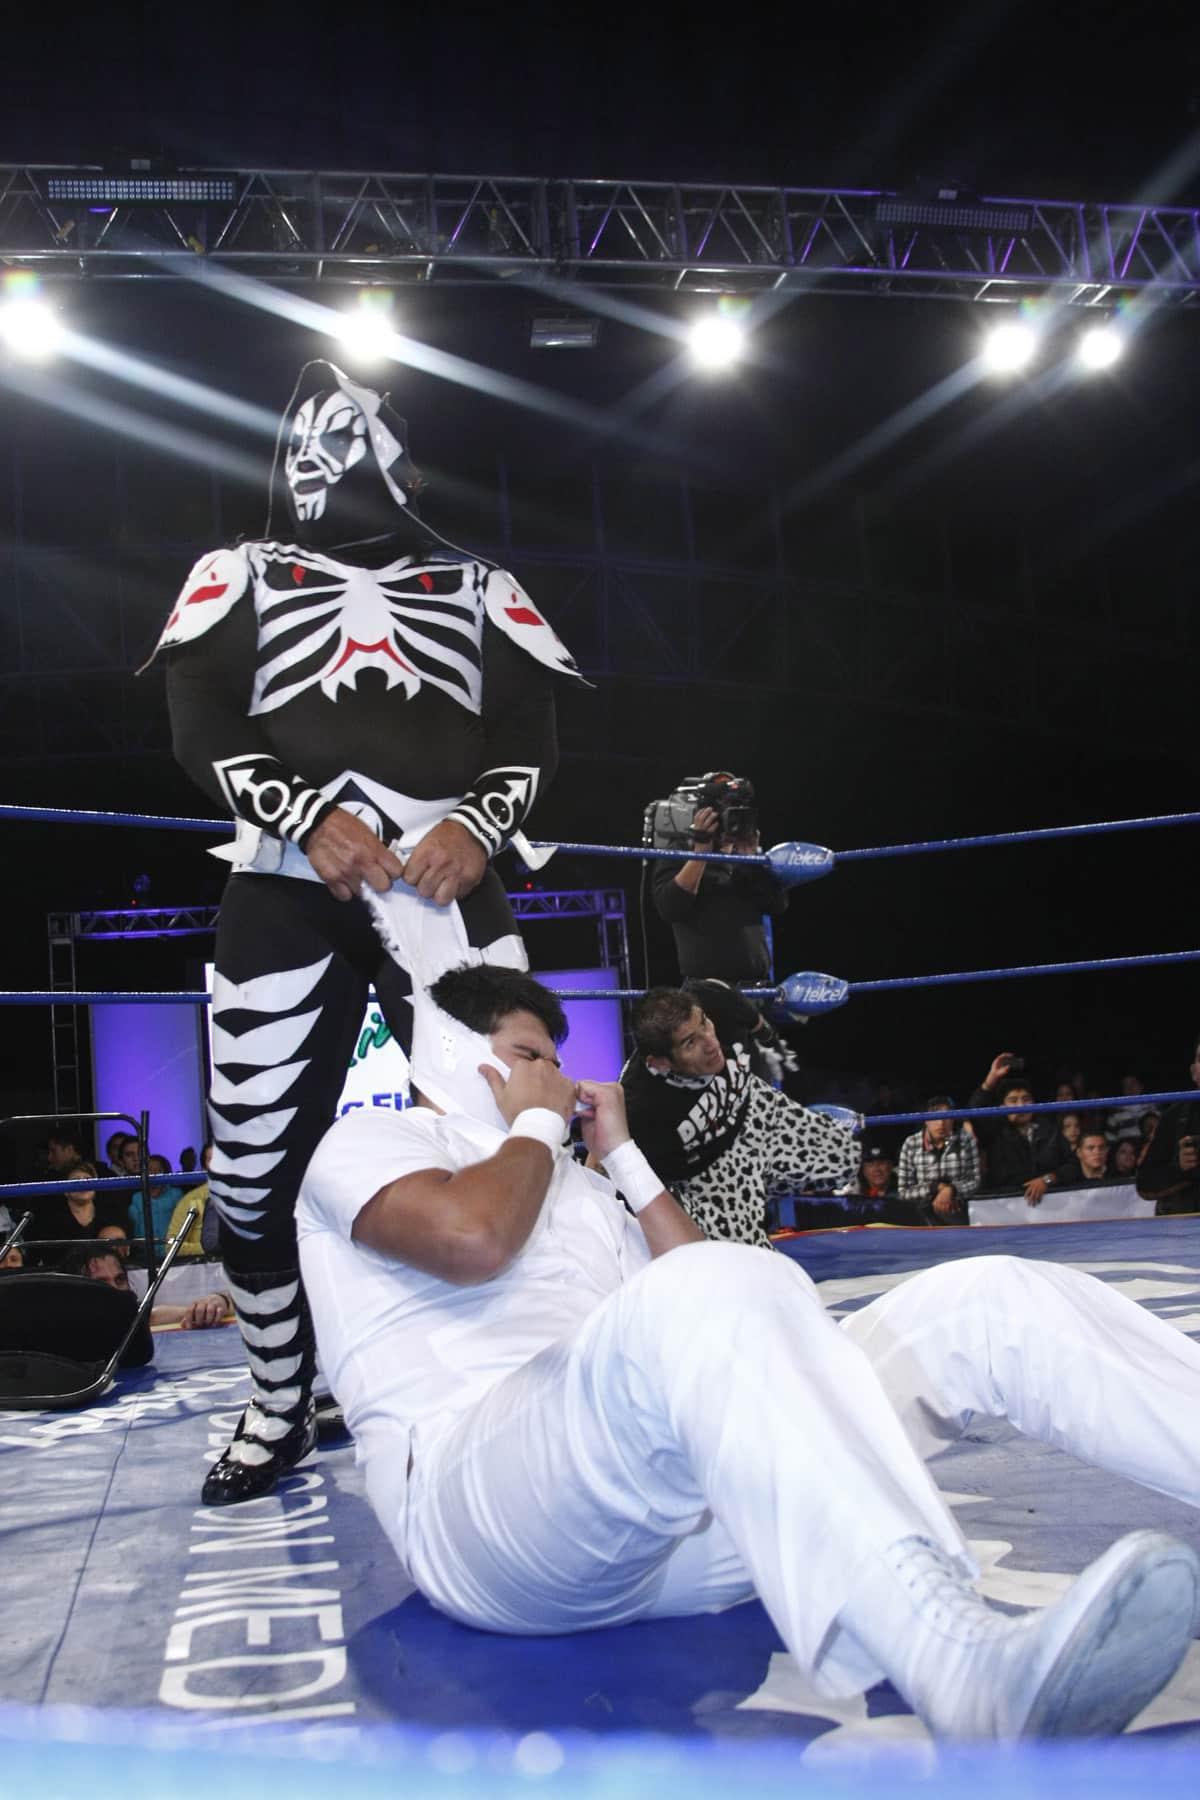 AAA: Lo sucedido este 26 de nov. en Pachuca – L.A. Park humilla al Hijo del Dr. Wagner Jr. – Gunner vence a Monster Clown 3